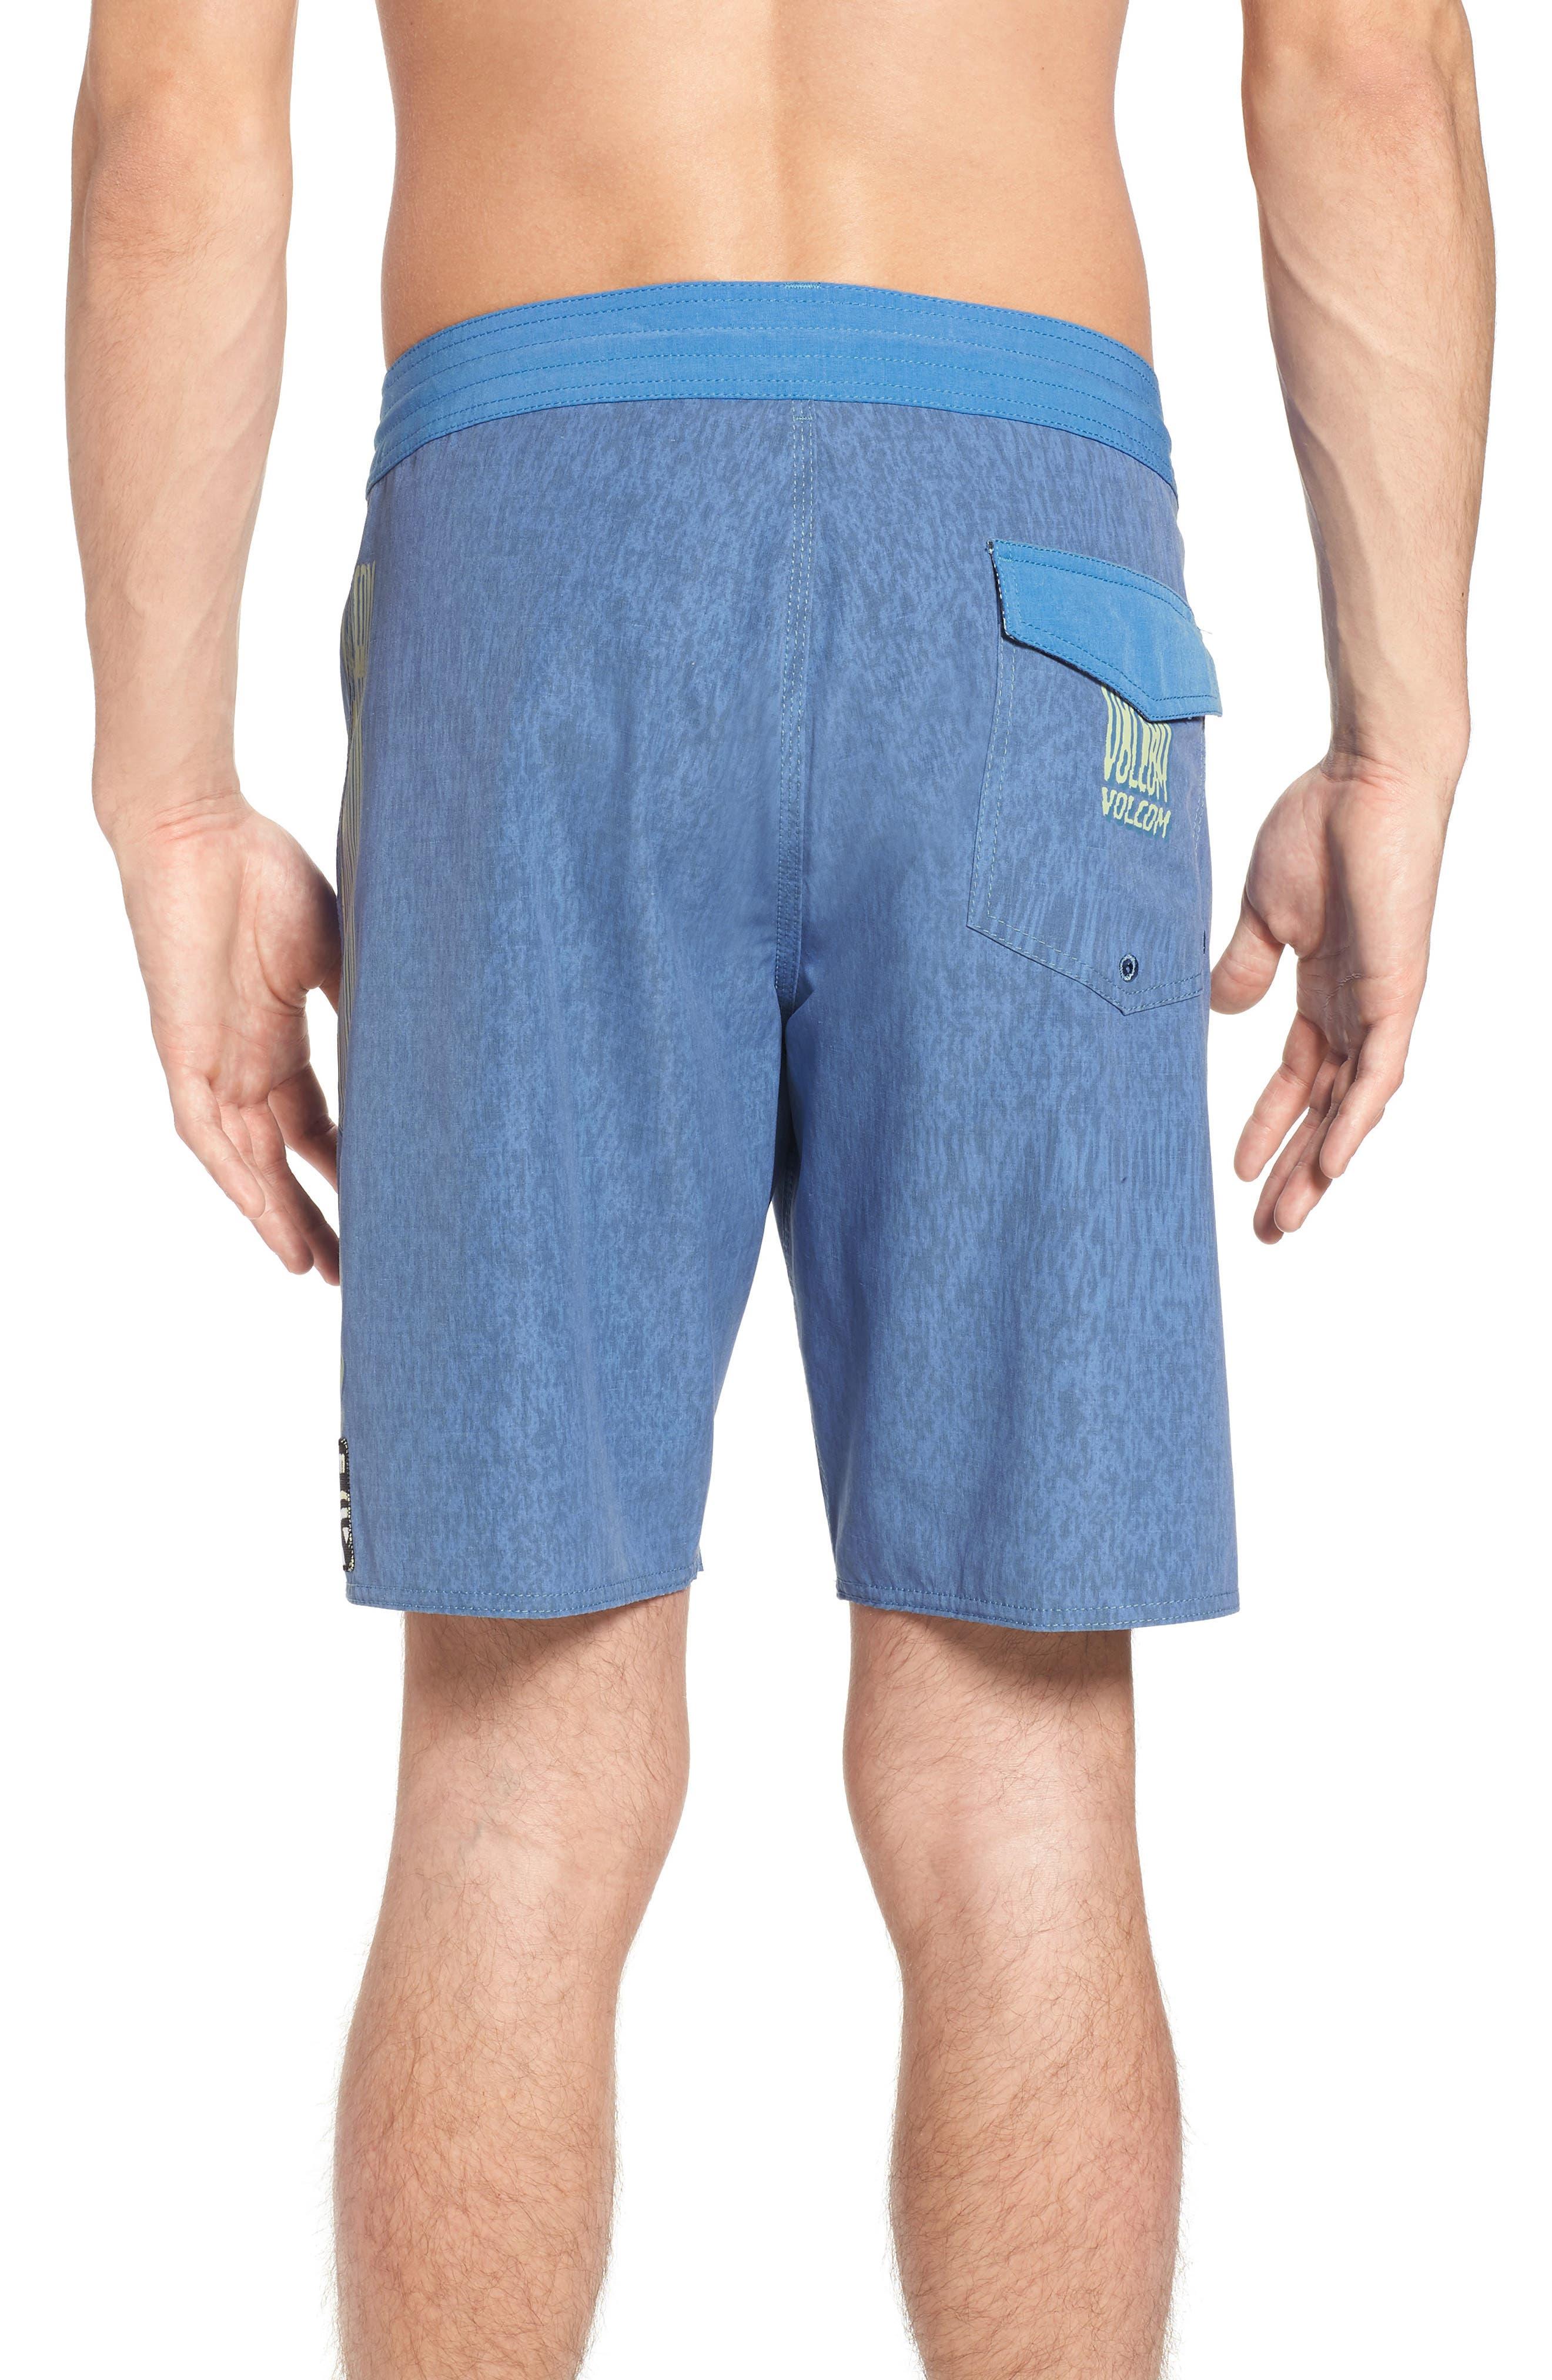 Side Fi Stoney Board Shorts,                             Alternate thumbnail 2, color,                             Blue Free